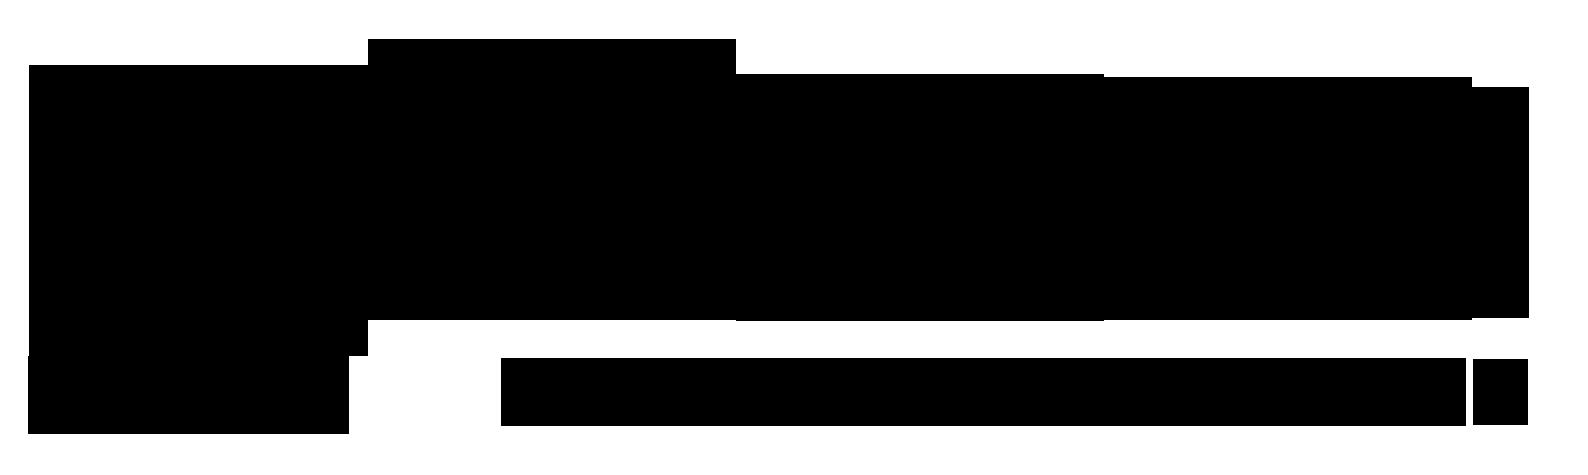 透明logo